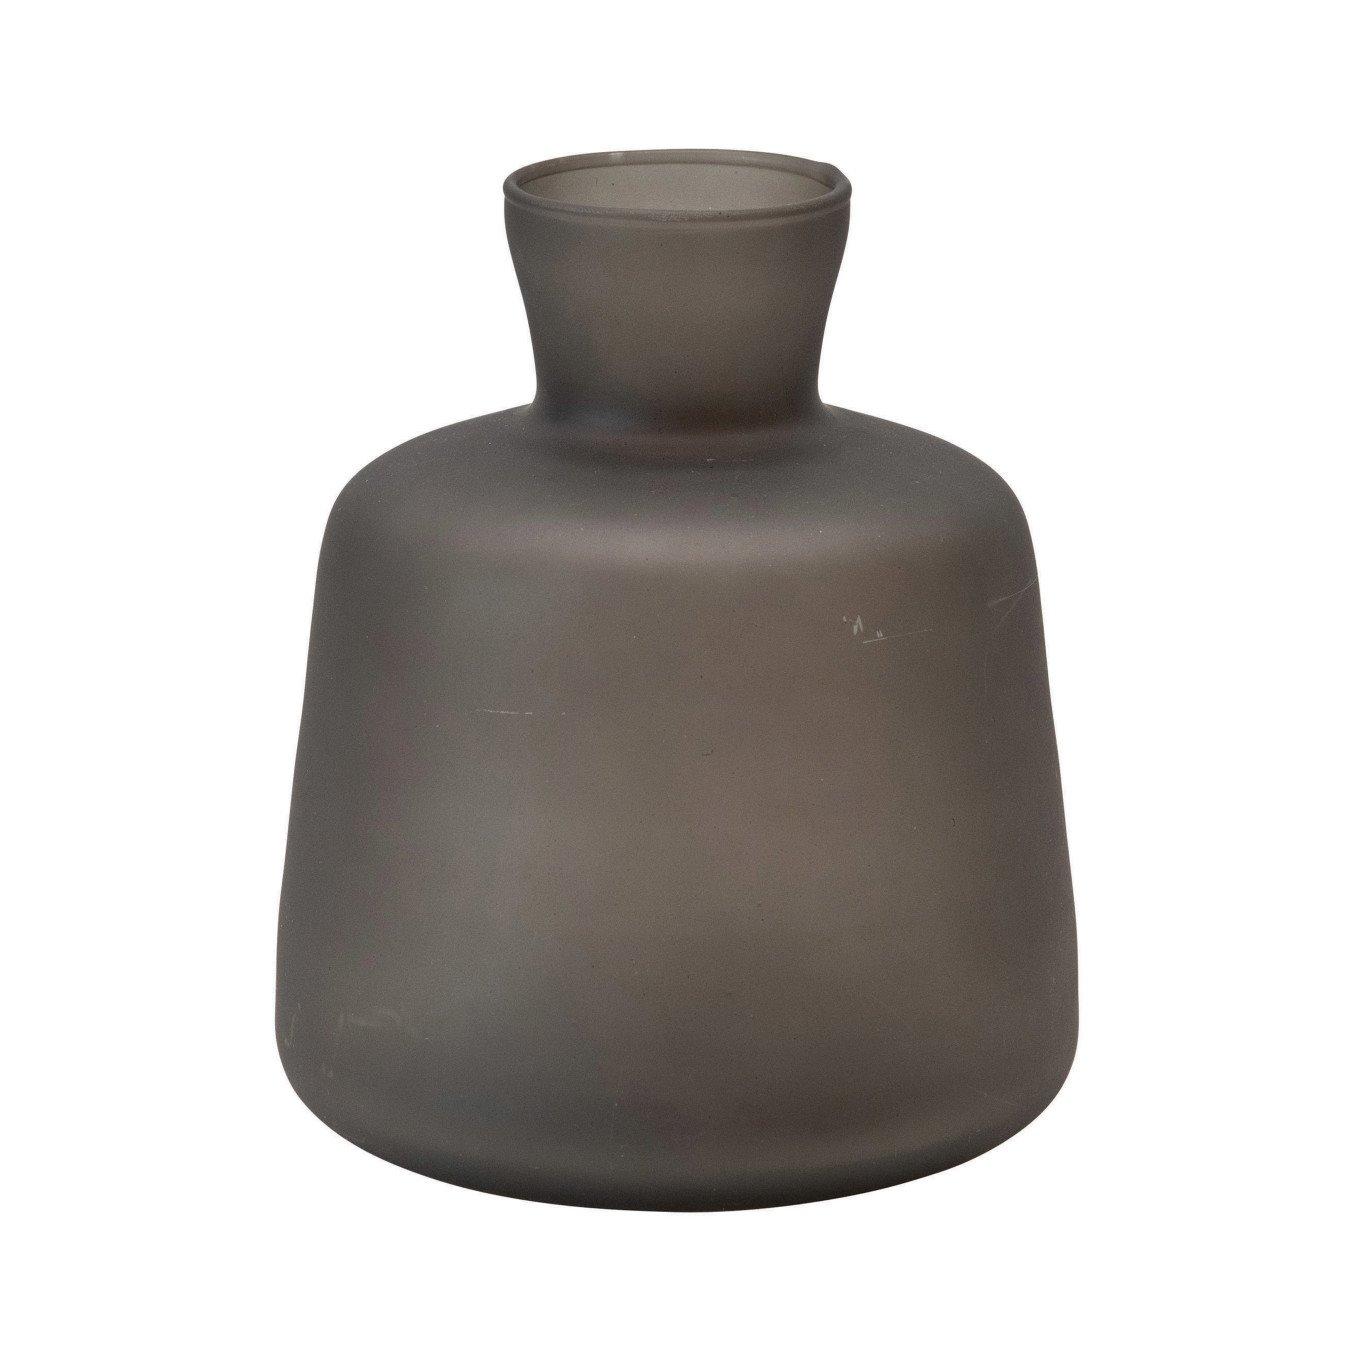 Glass Vase, Black Frosted Finish